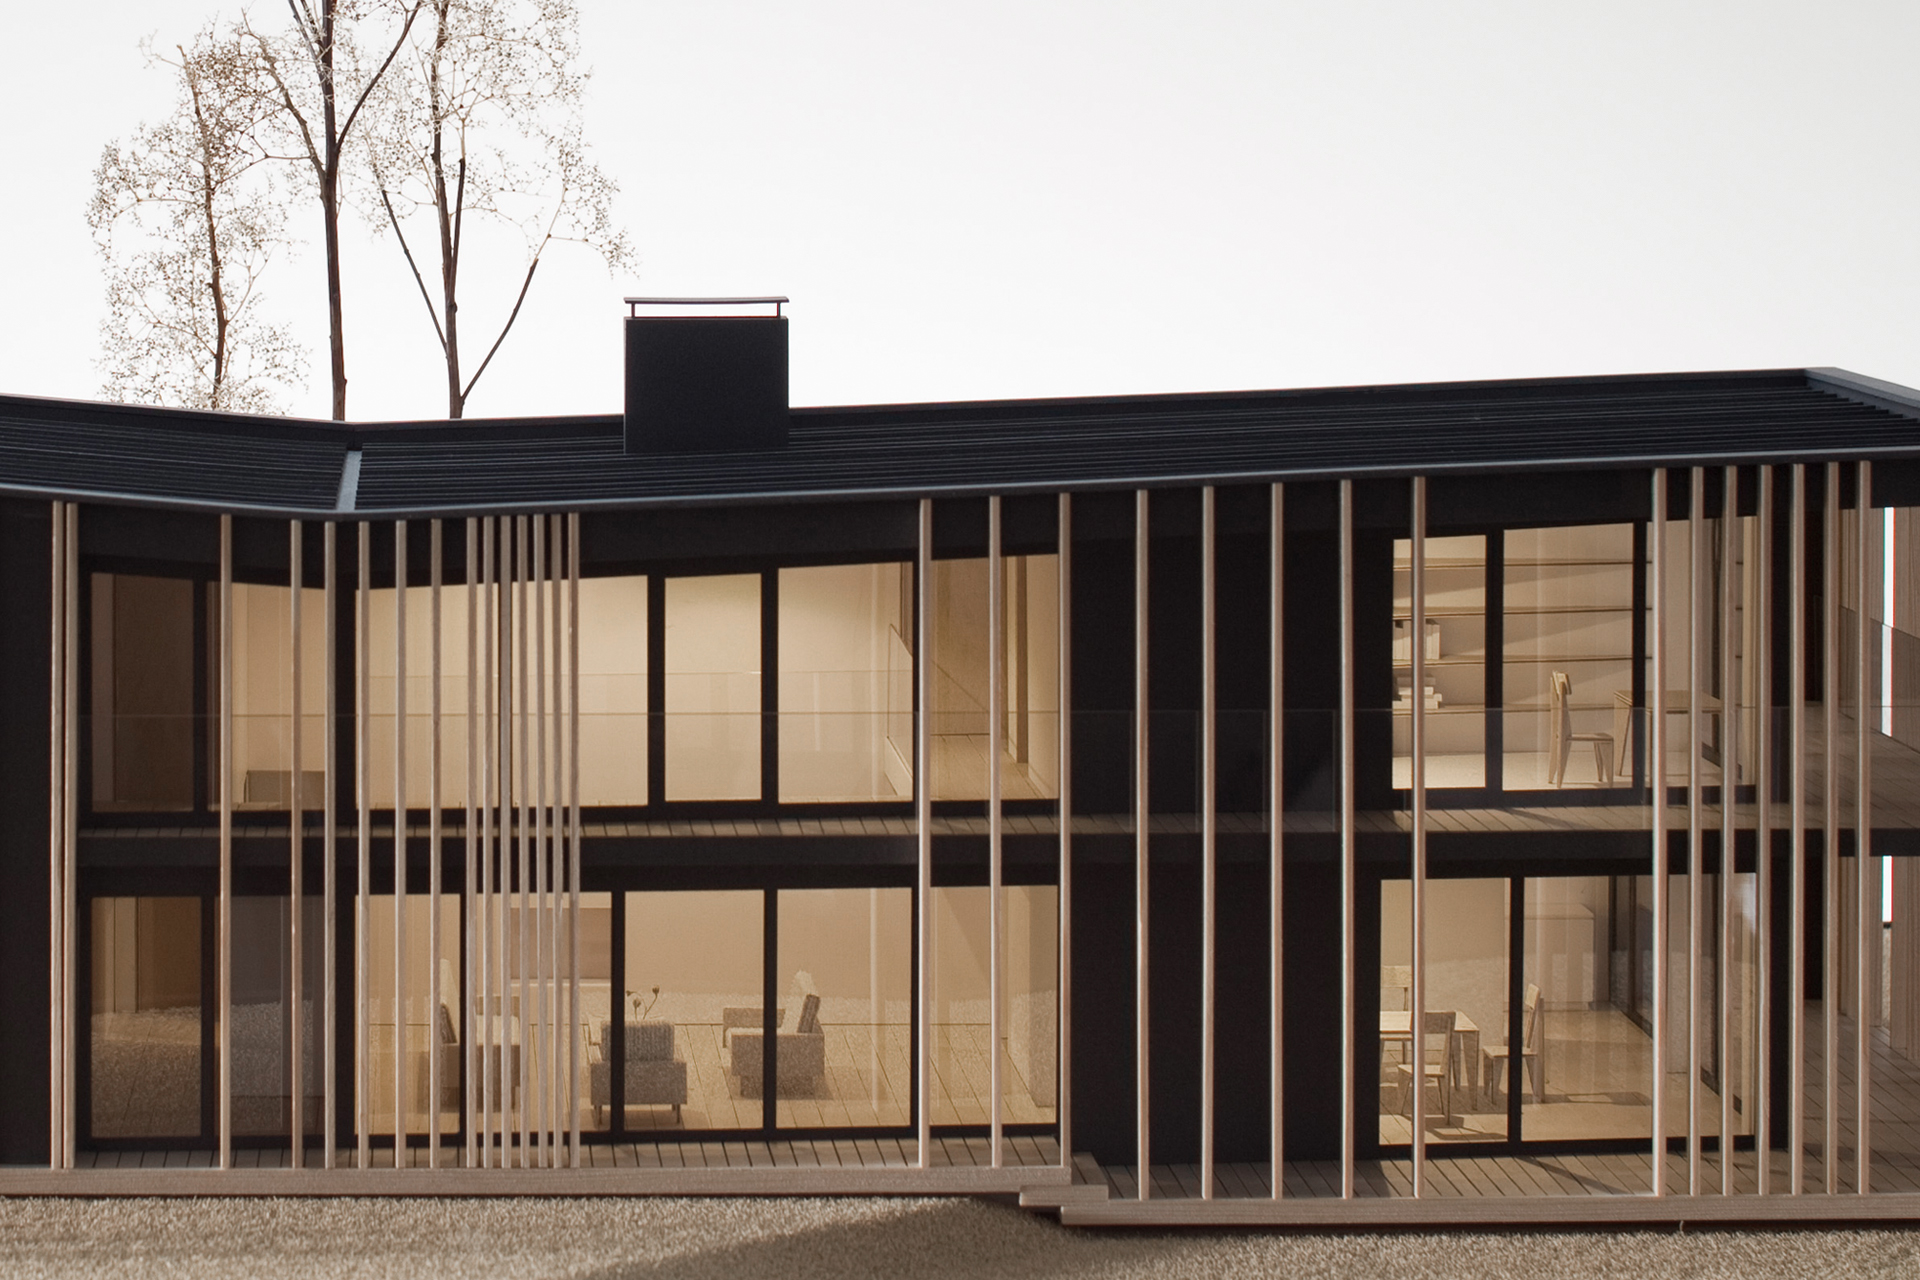 onimo-makiety-architektoniczne-PAG-shutter-06